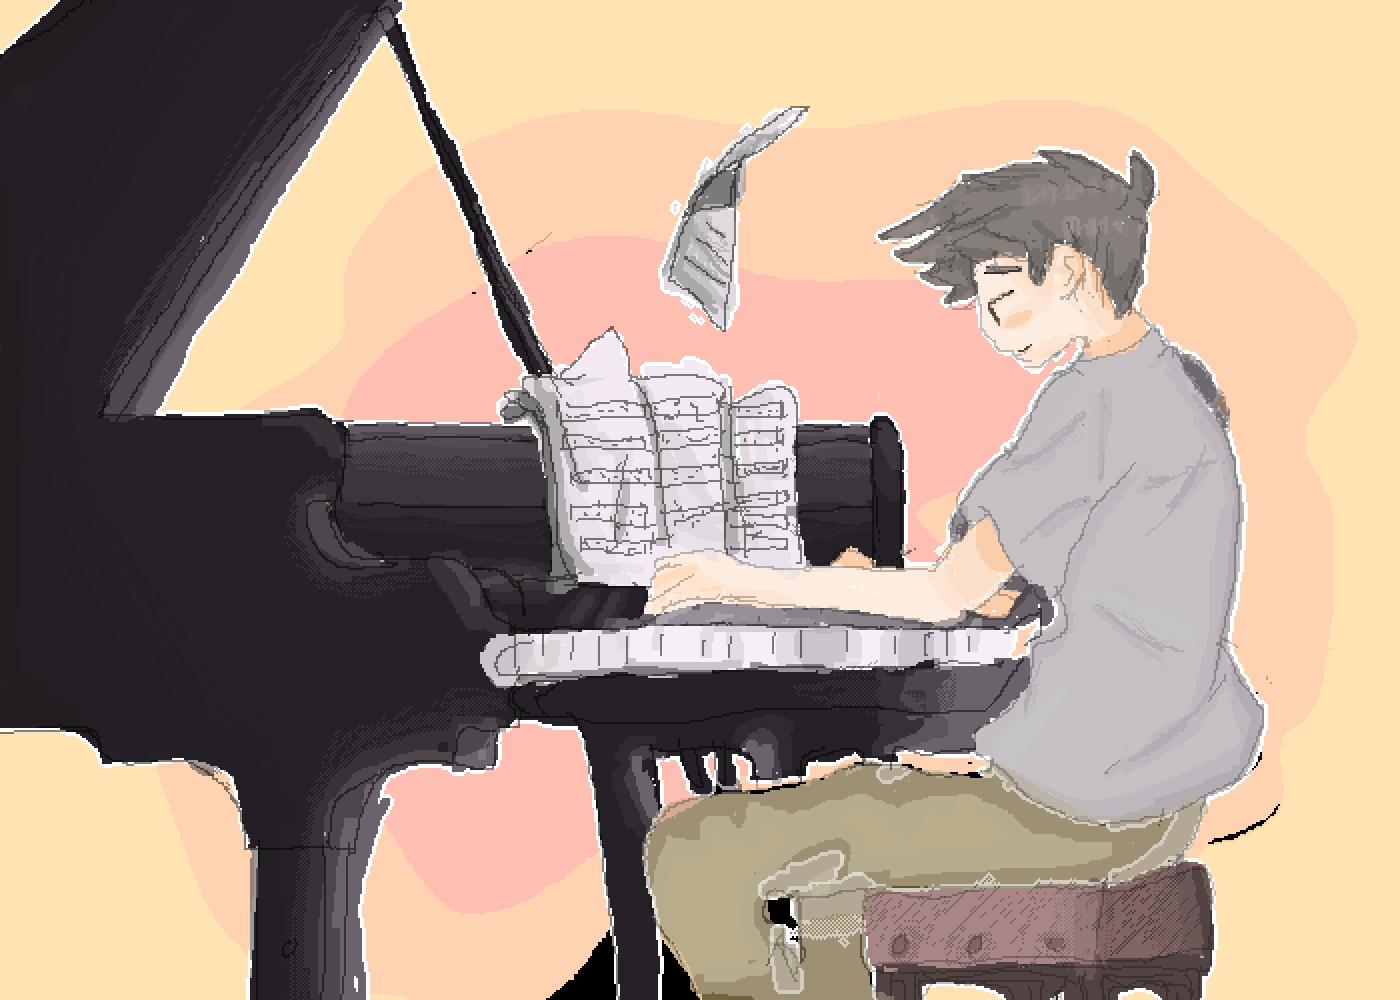 Music dreams. by RaisinOat